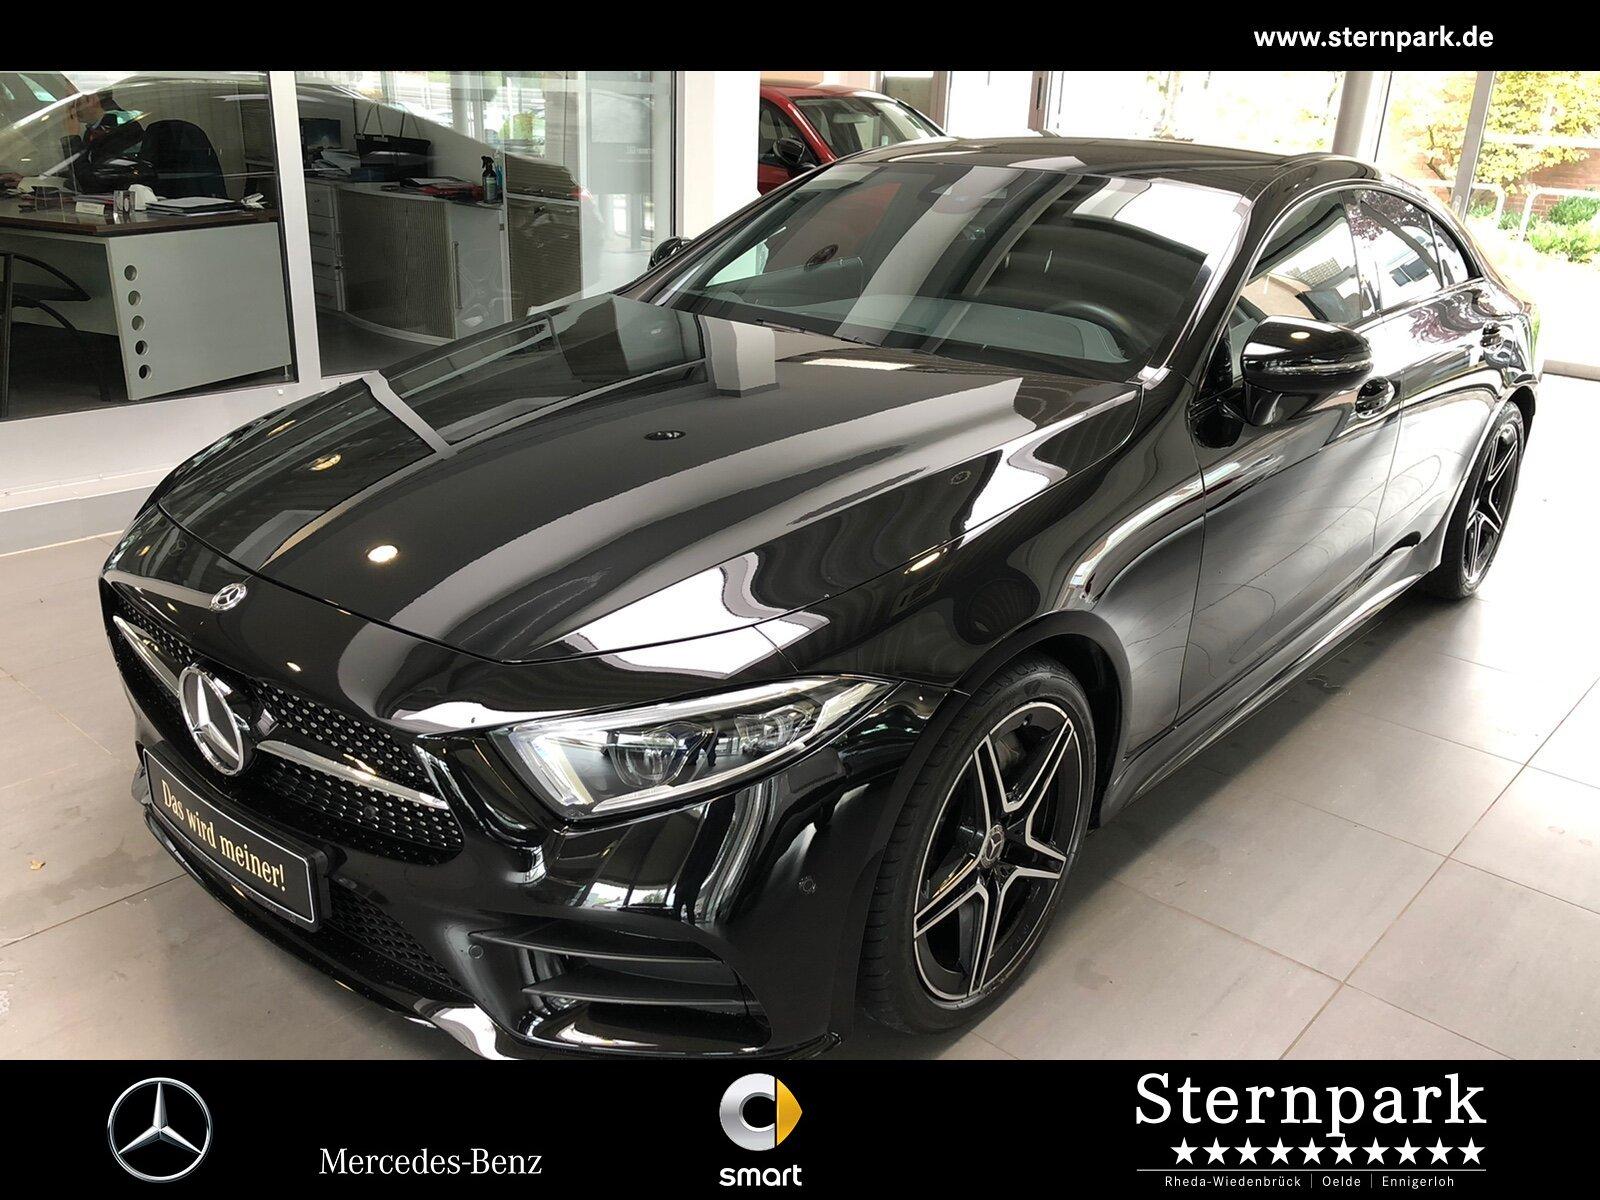 Mercedes-Benz CLS 300 d AMG Comand*MULTIBEAM*Kamera*Widescreen, Jahr 2018, Diesel